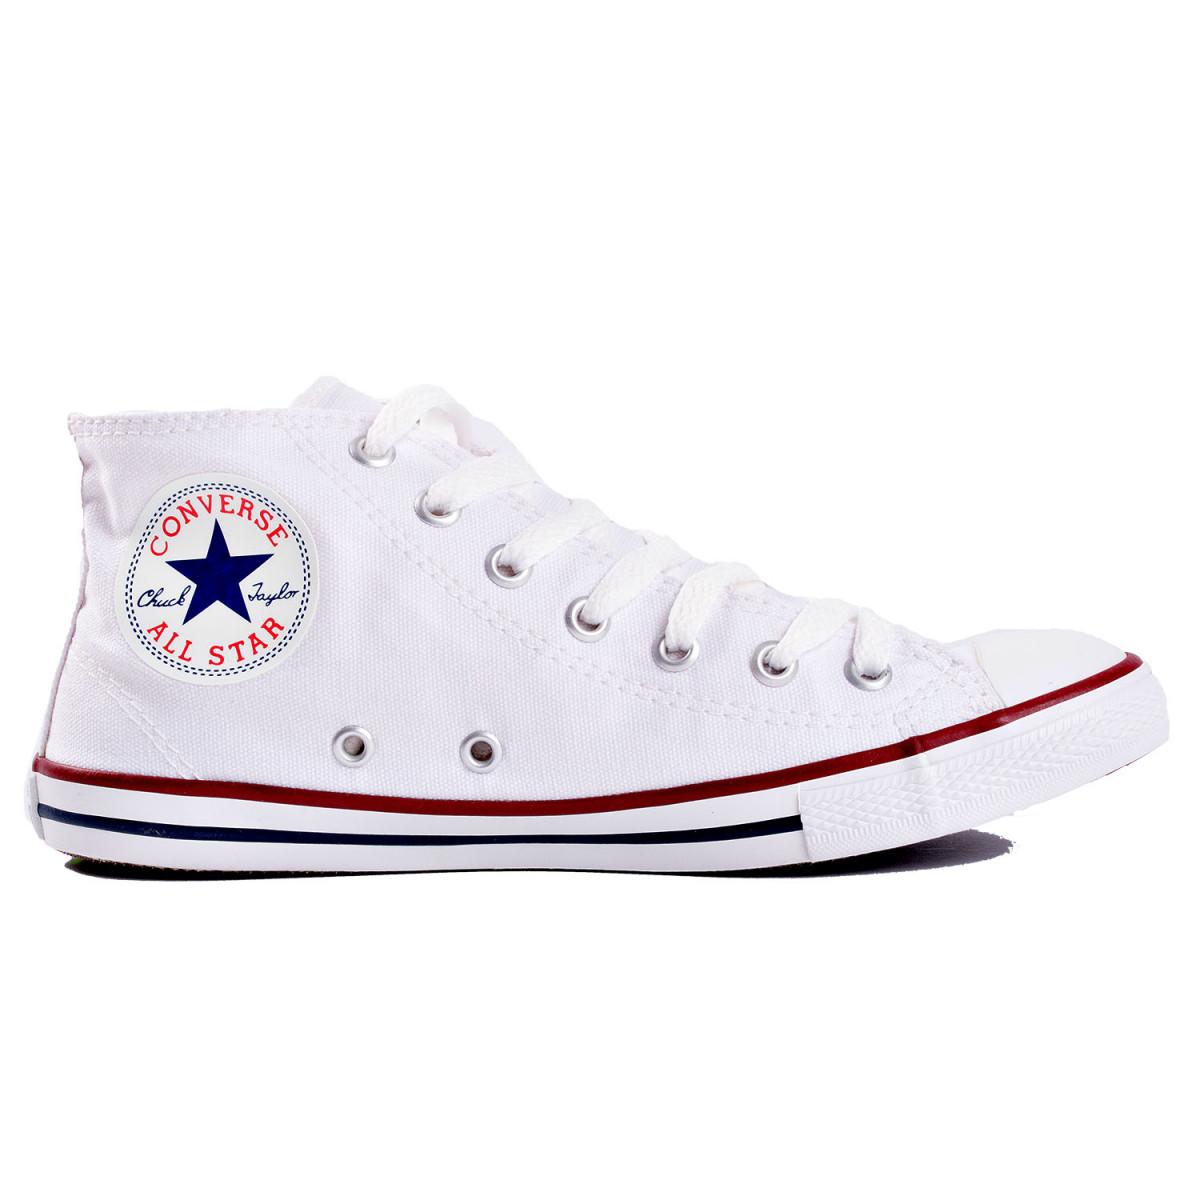 Zapatillas Converse Chuck Taylor All Star Dainty